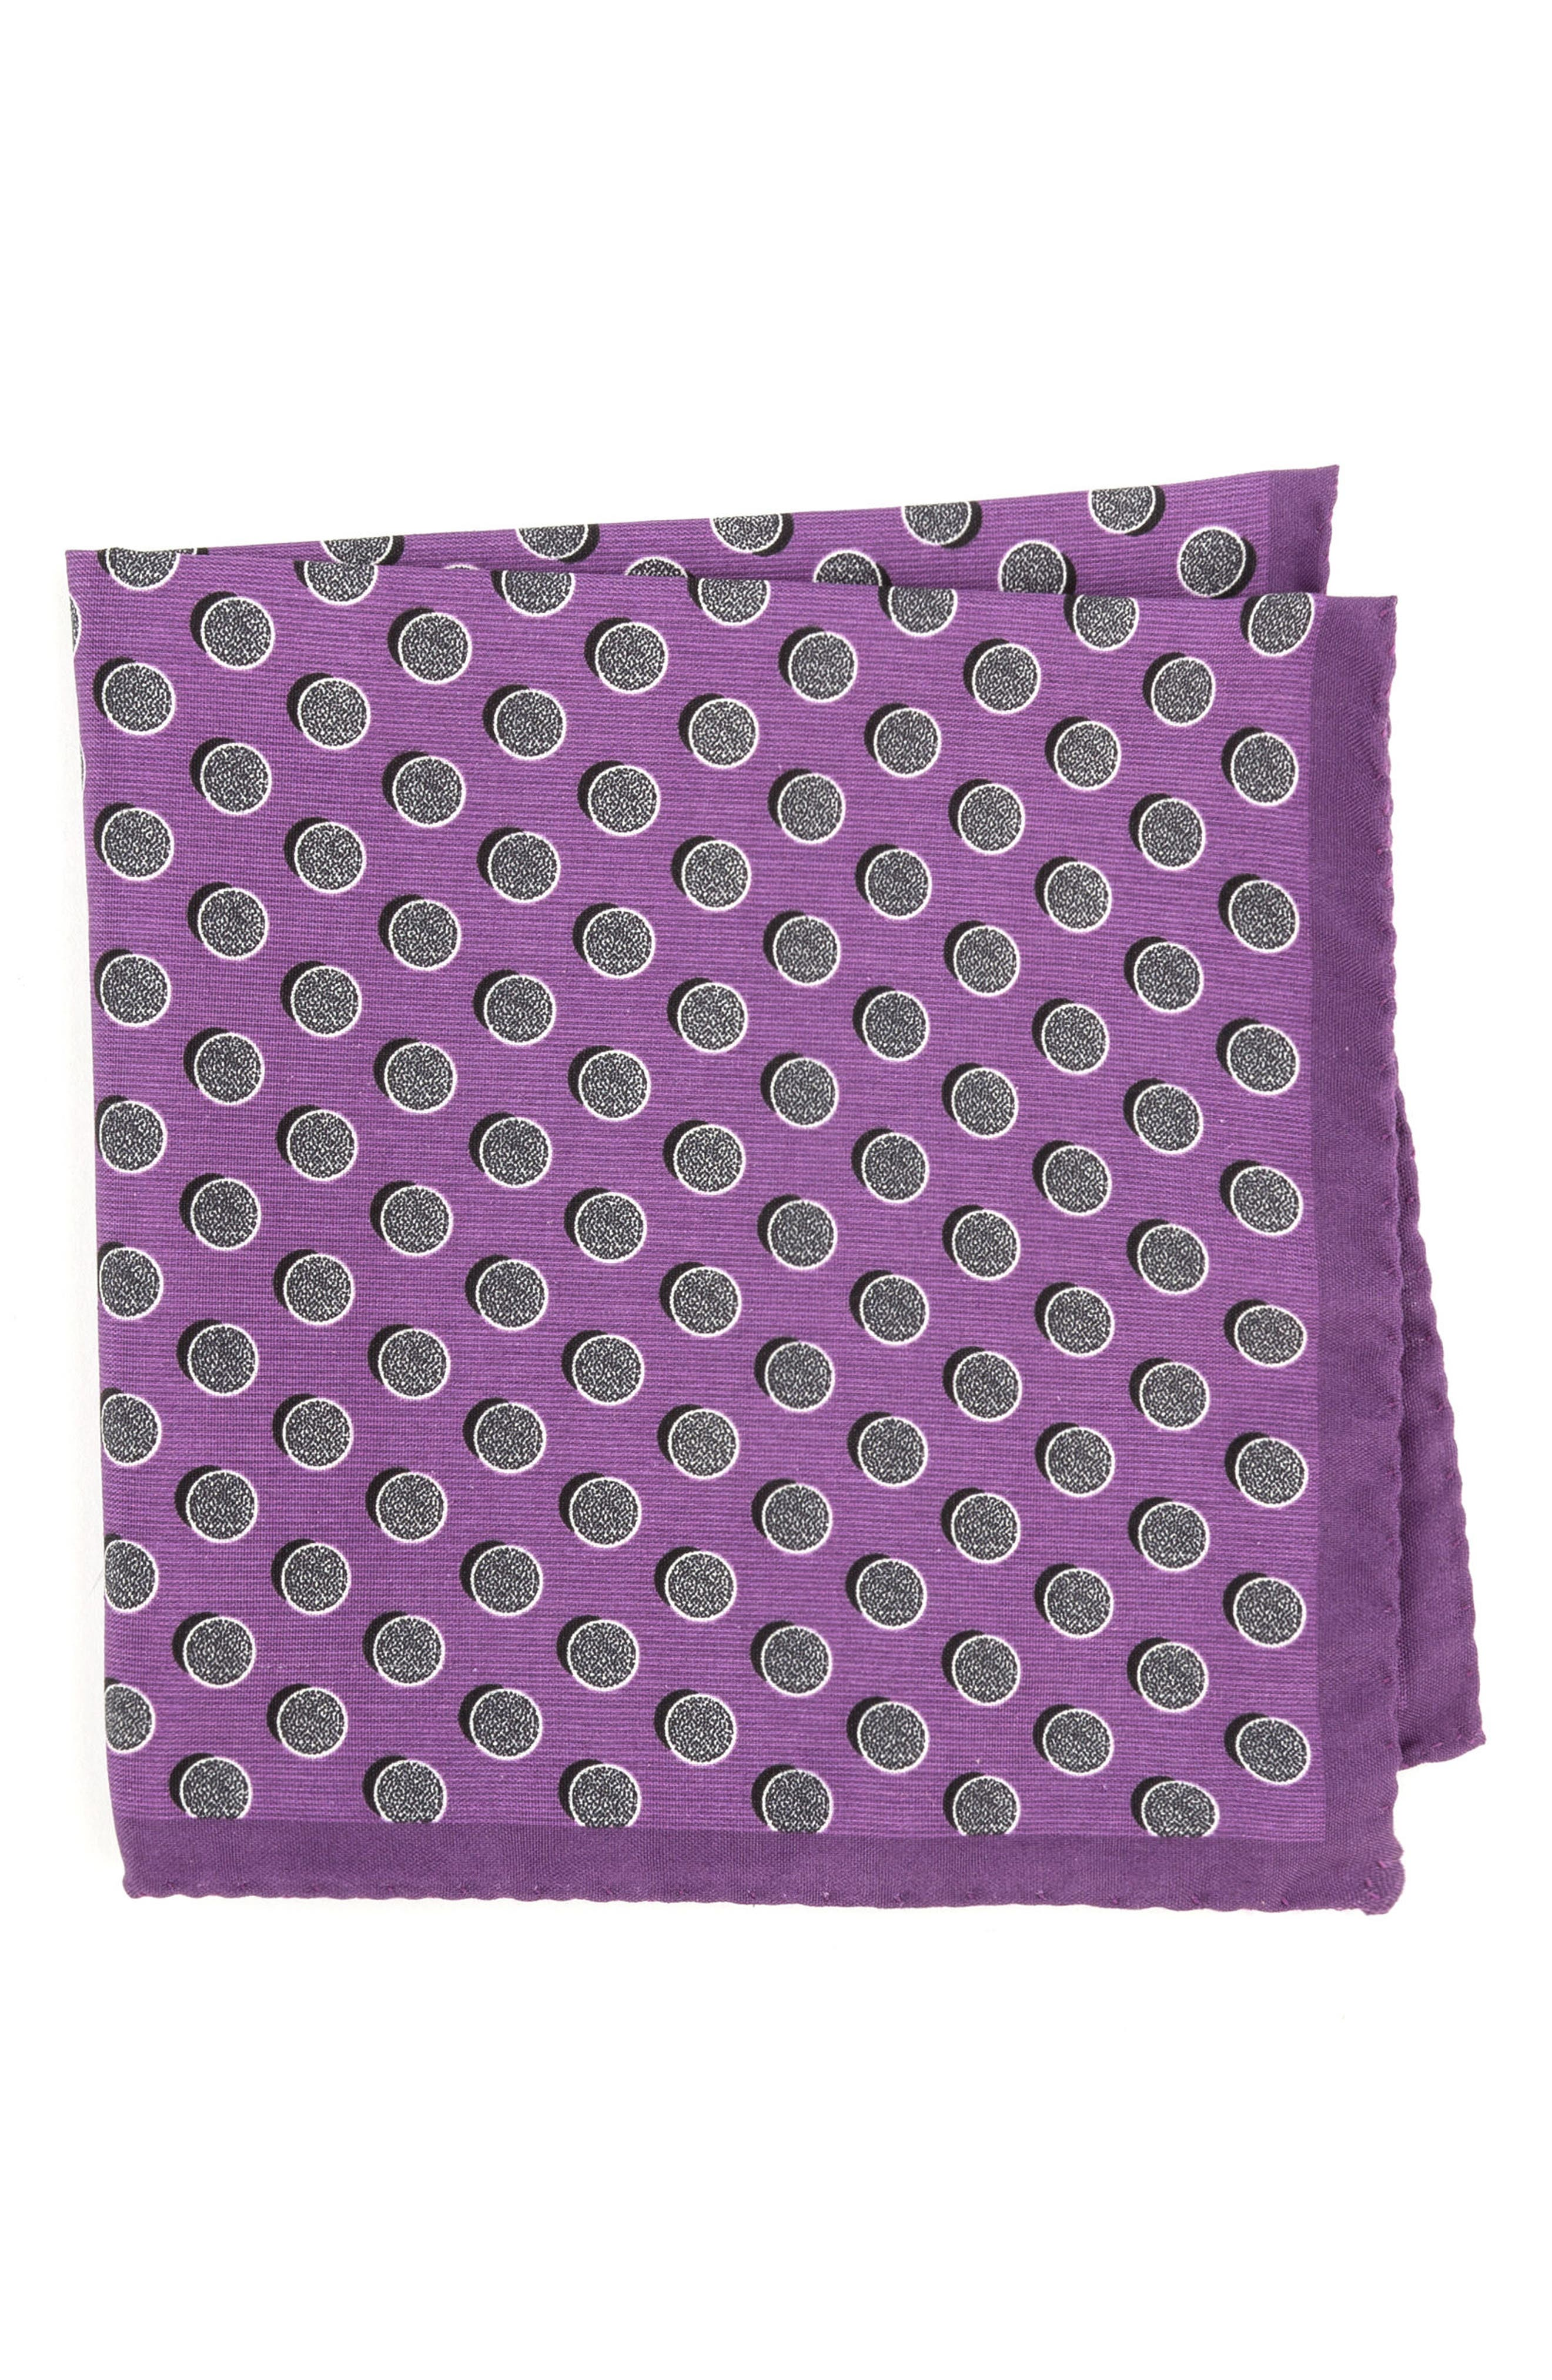 Ted Baker London Dot Silk Pocket Square